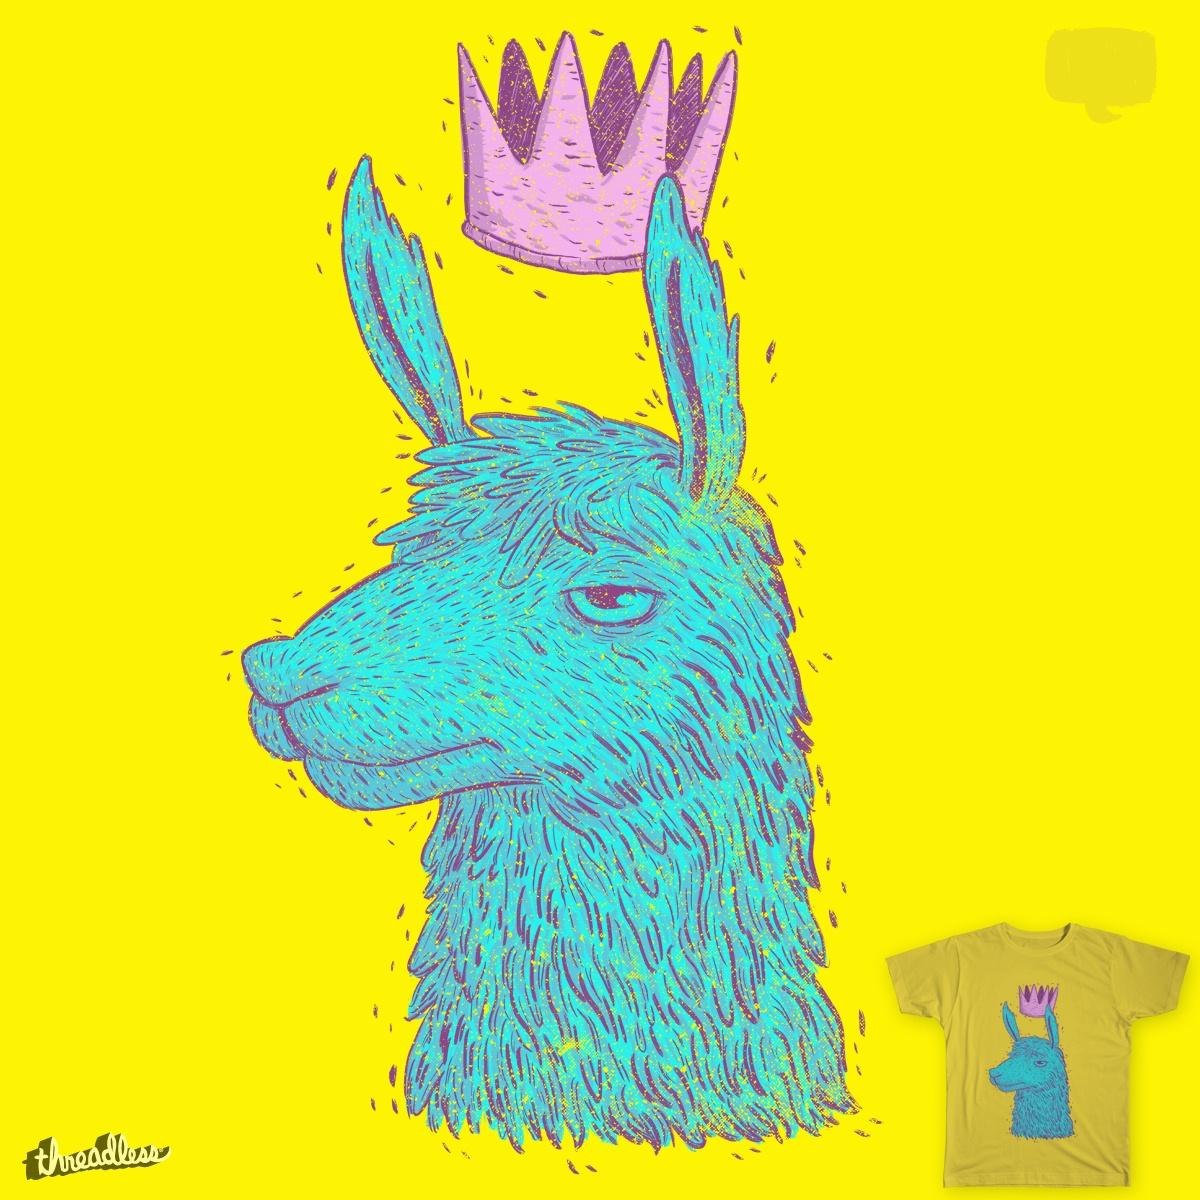 Llama King by lxromero on Threadless